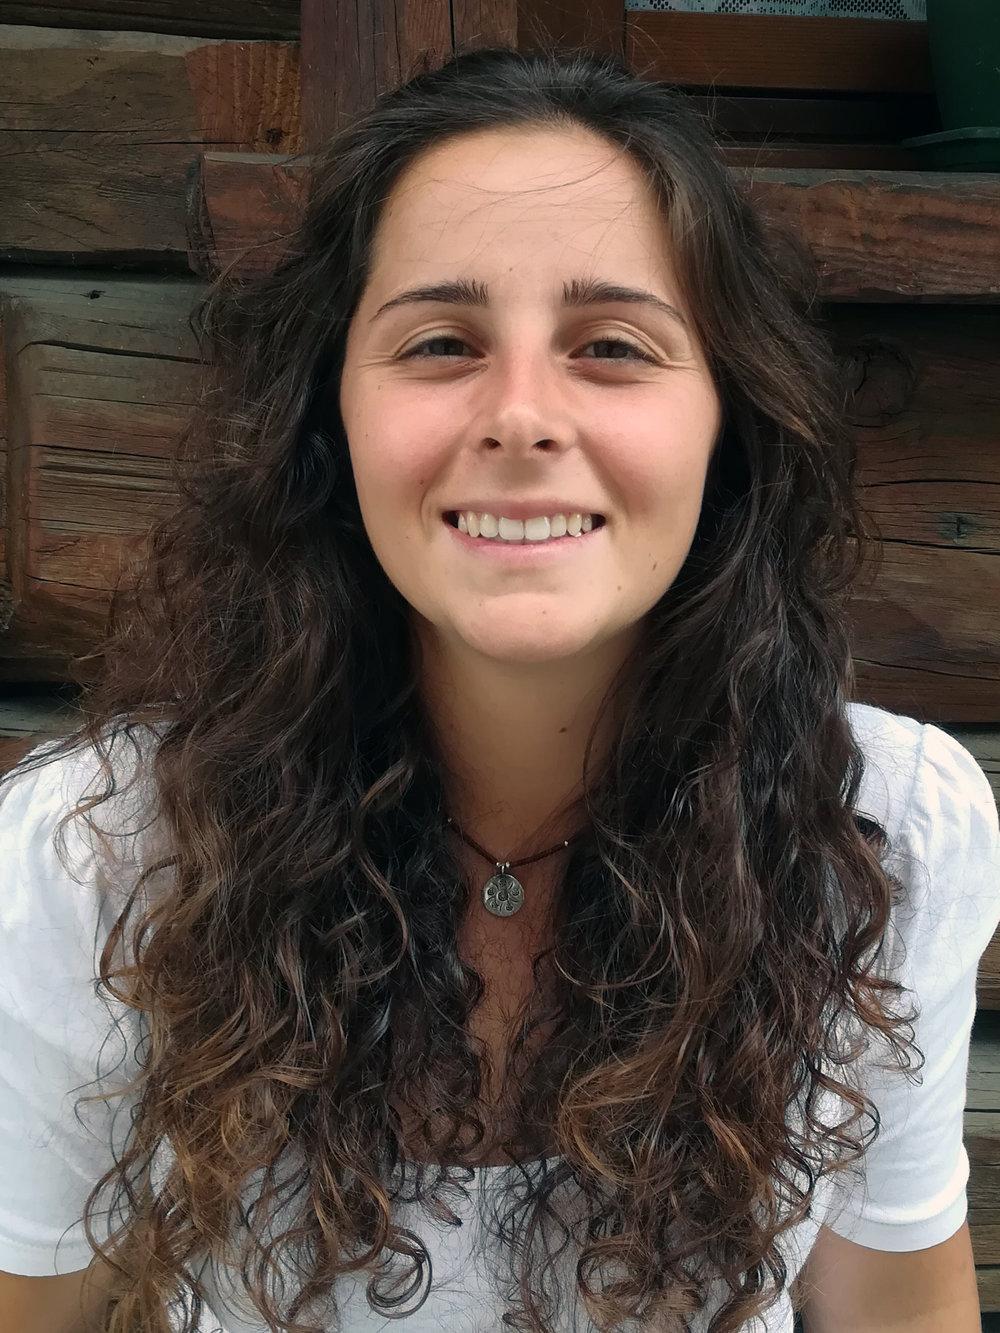 Chiara Saponaro, Italy